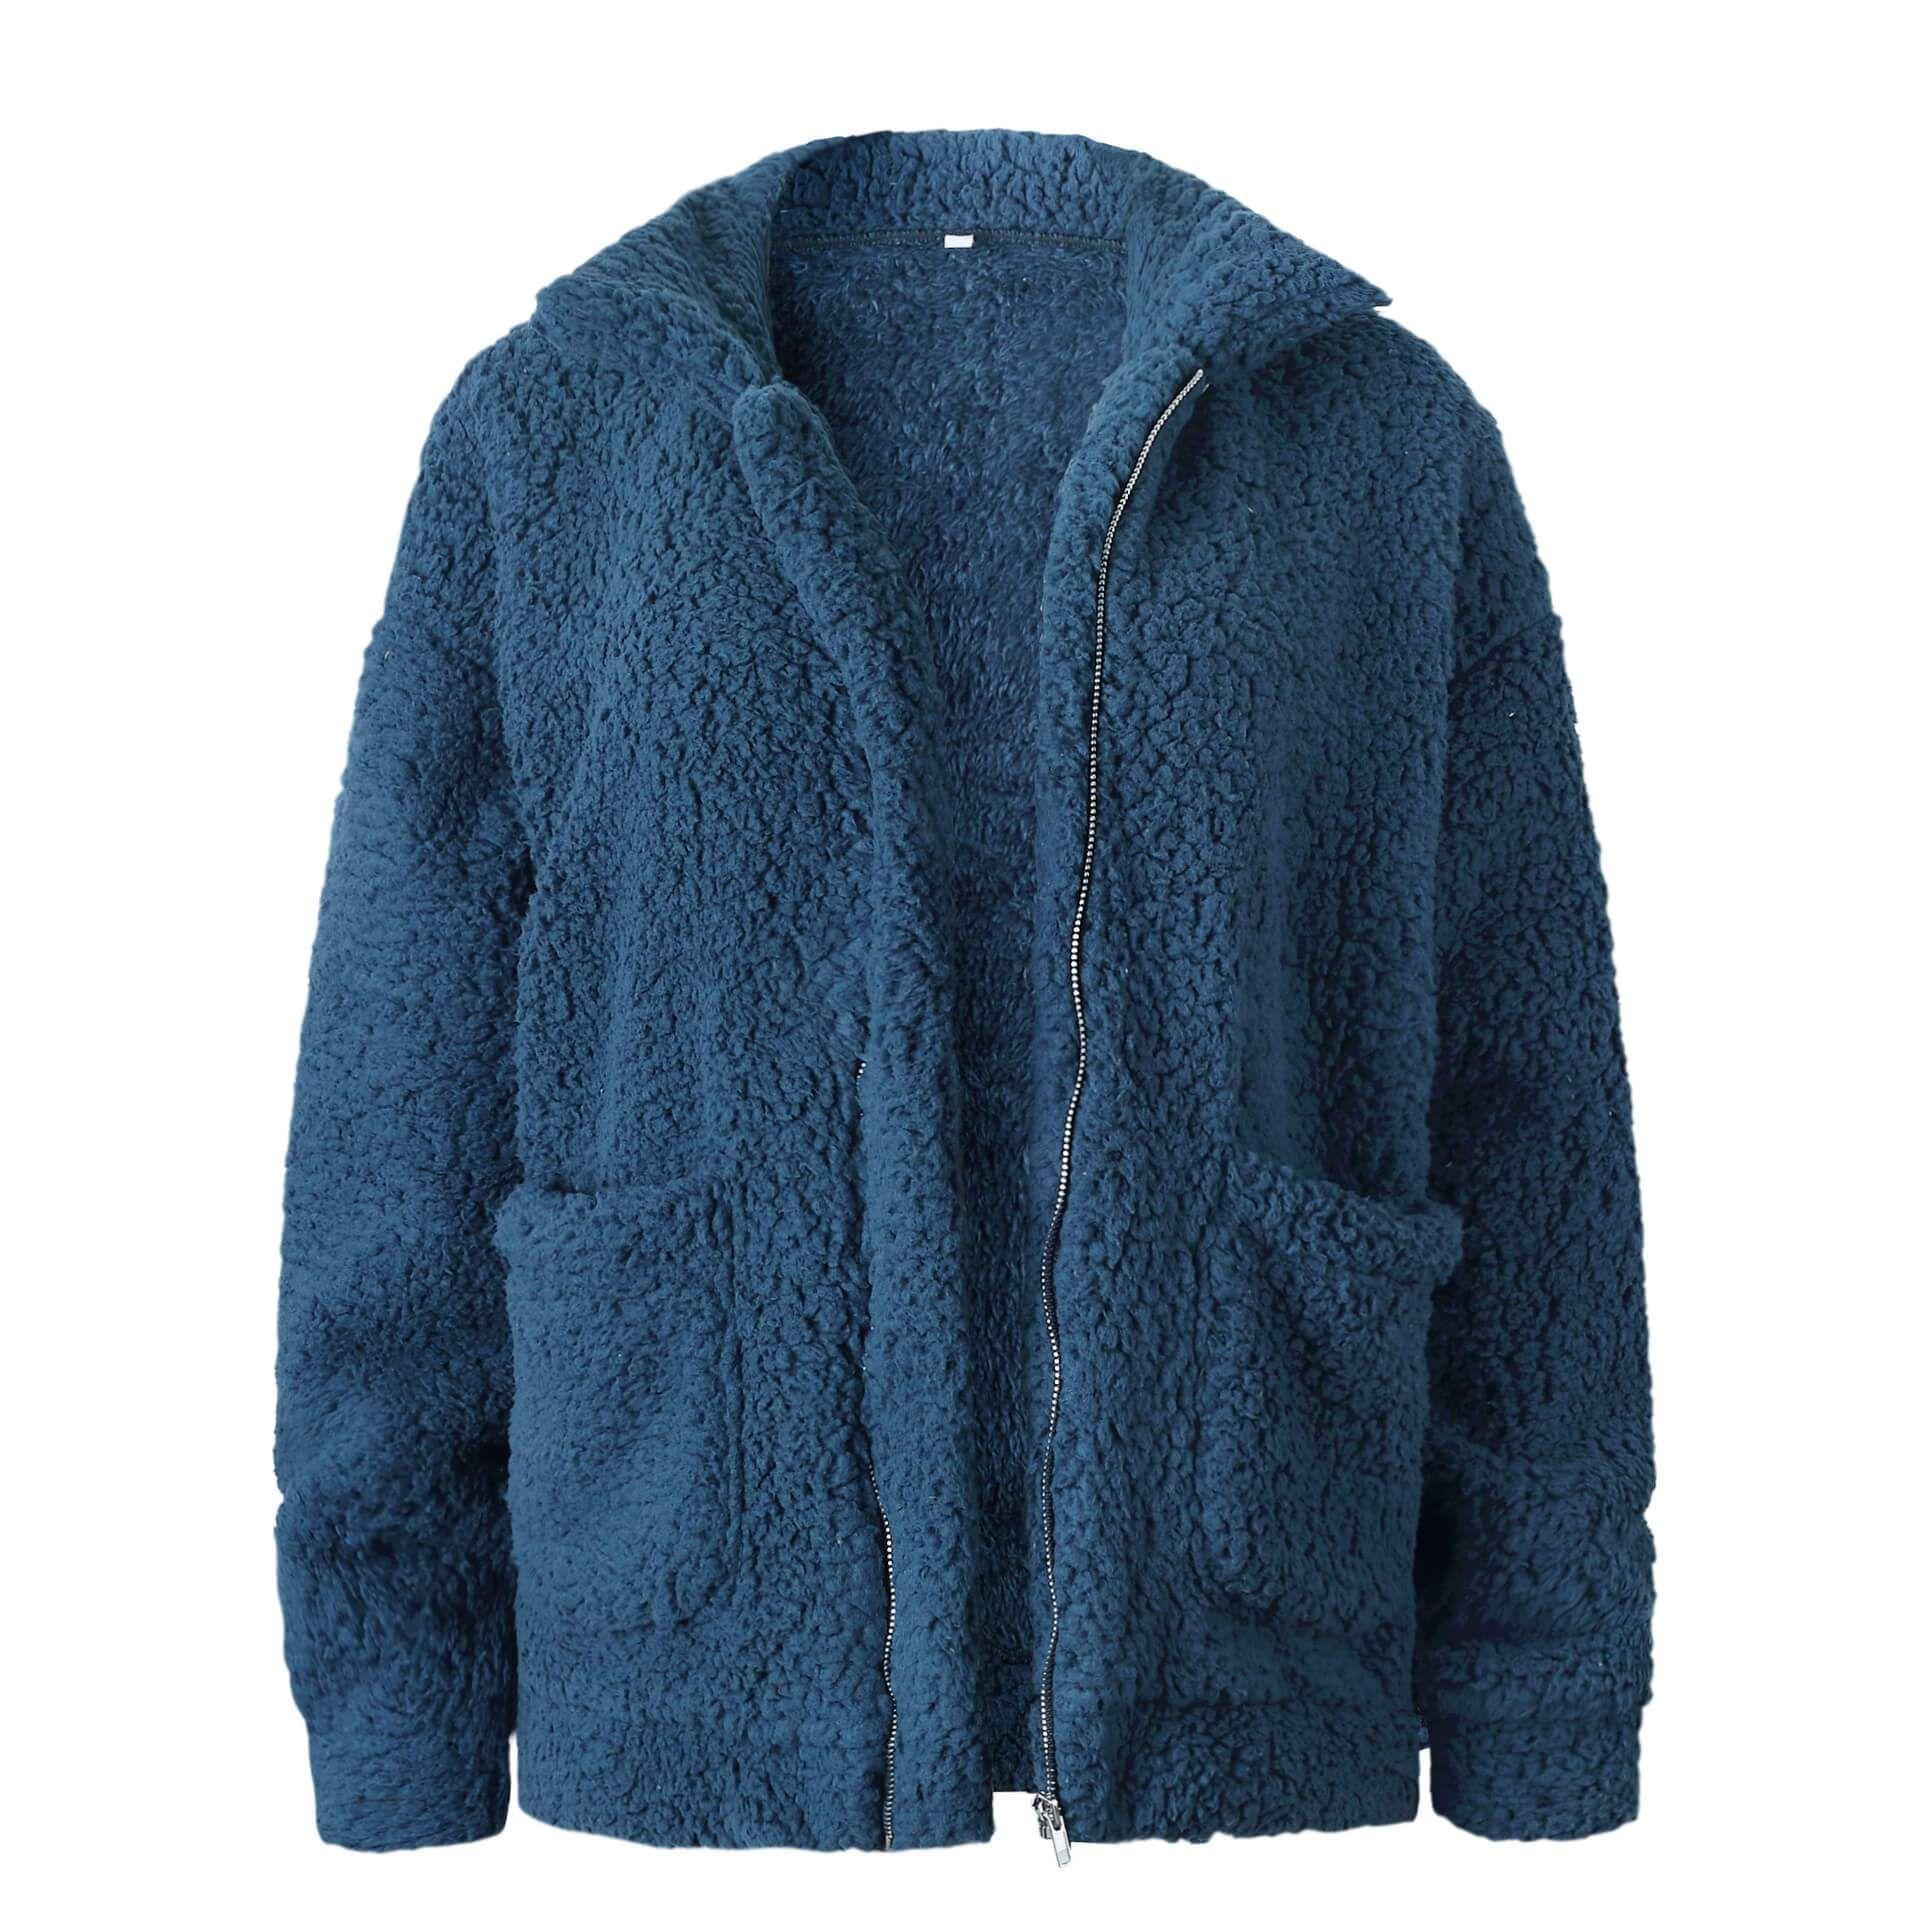 Plus Size Womens Coat Casual Soft Woolen Fleece Jumper Fluffy Ladies Cardigan!